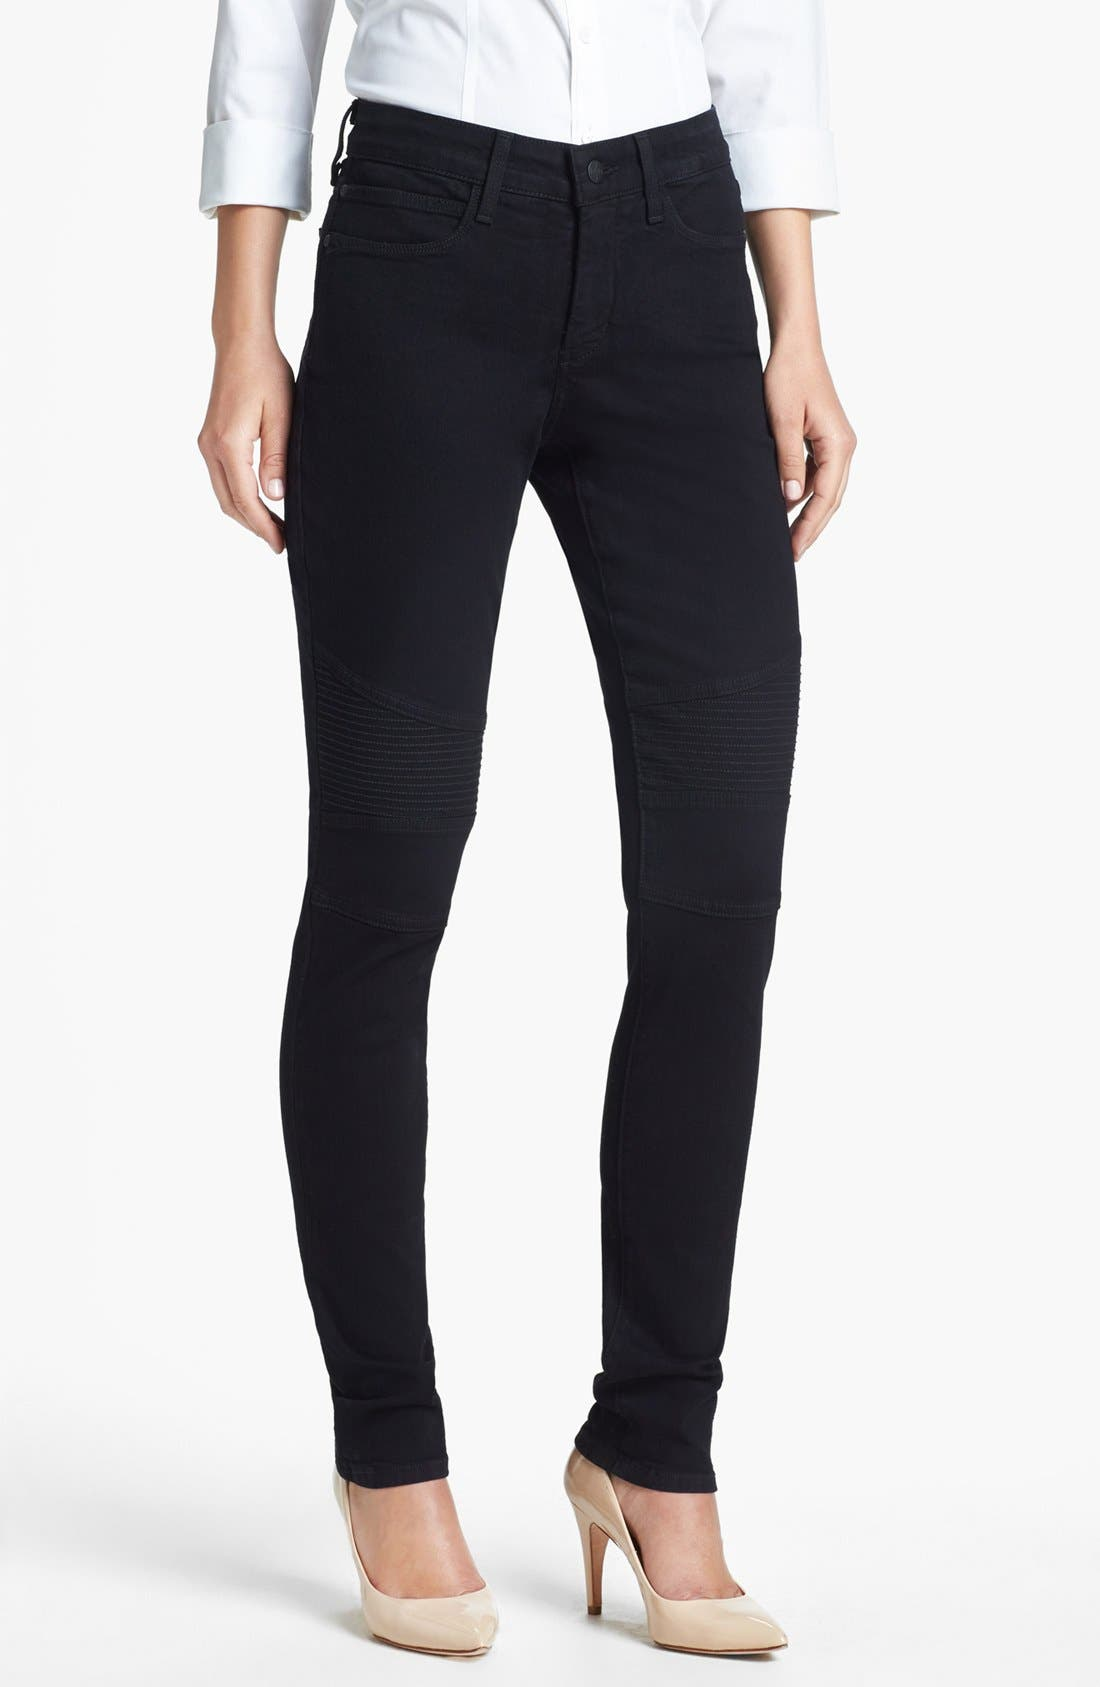 Alternate Image 1 Selected - NYDJ Gabriella' Stretch Moto Skinny Jeans (Black)